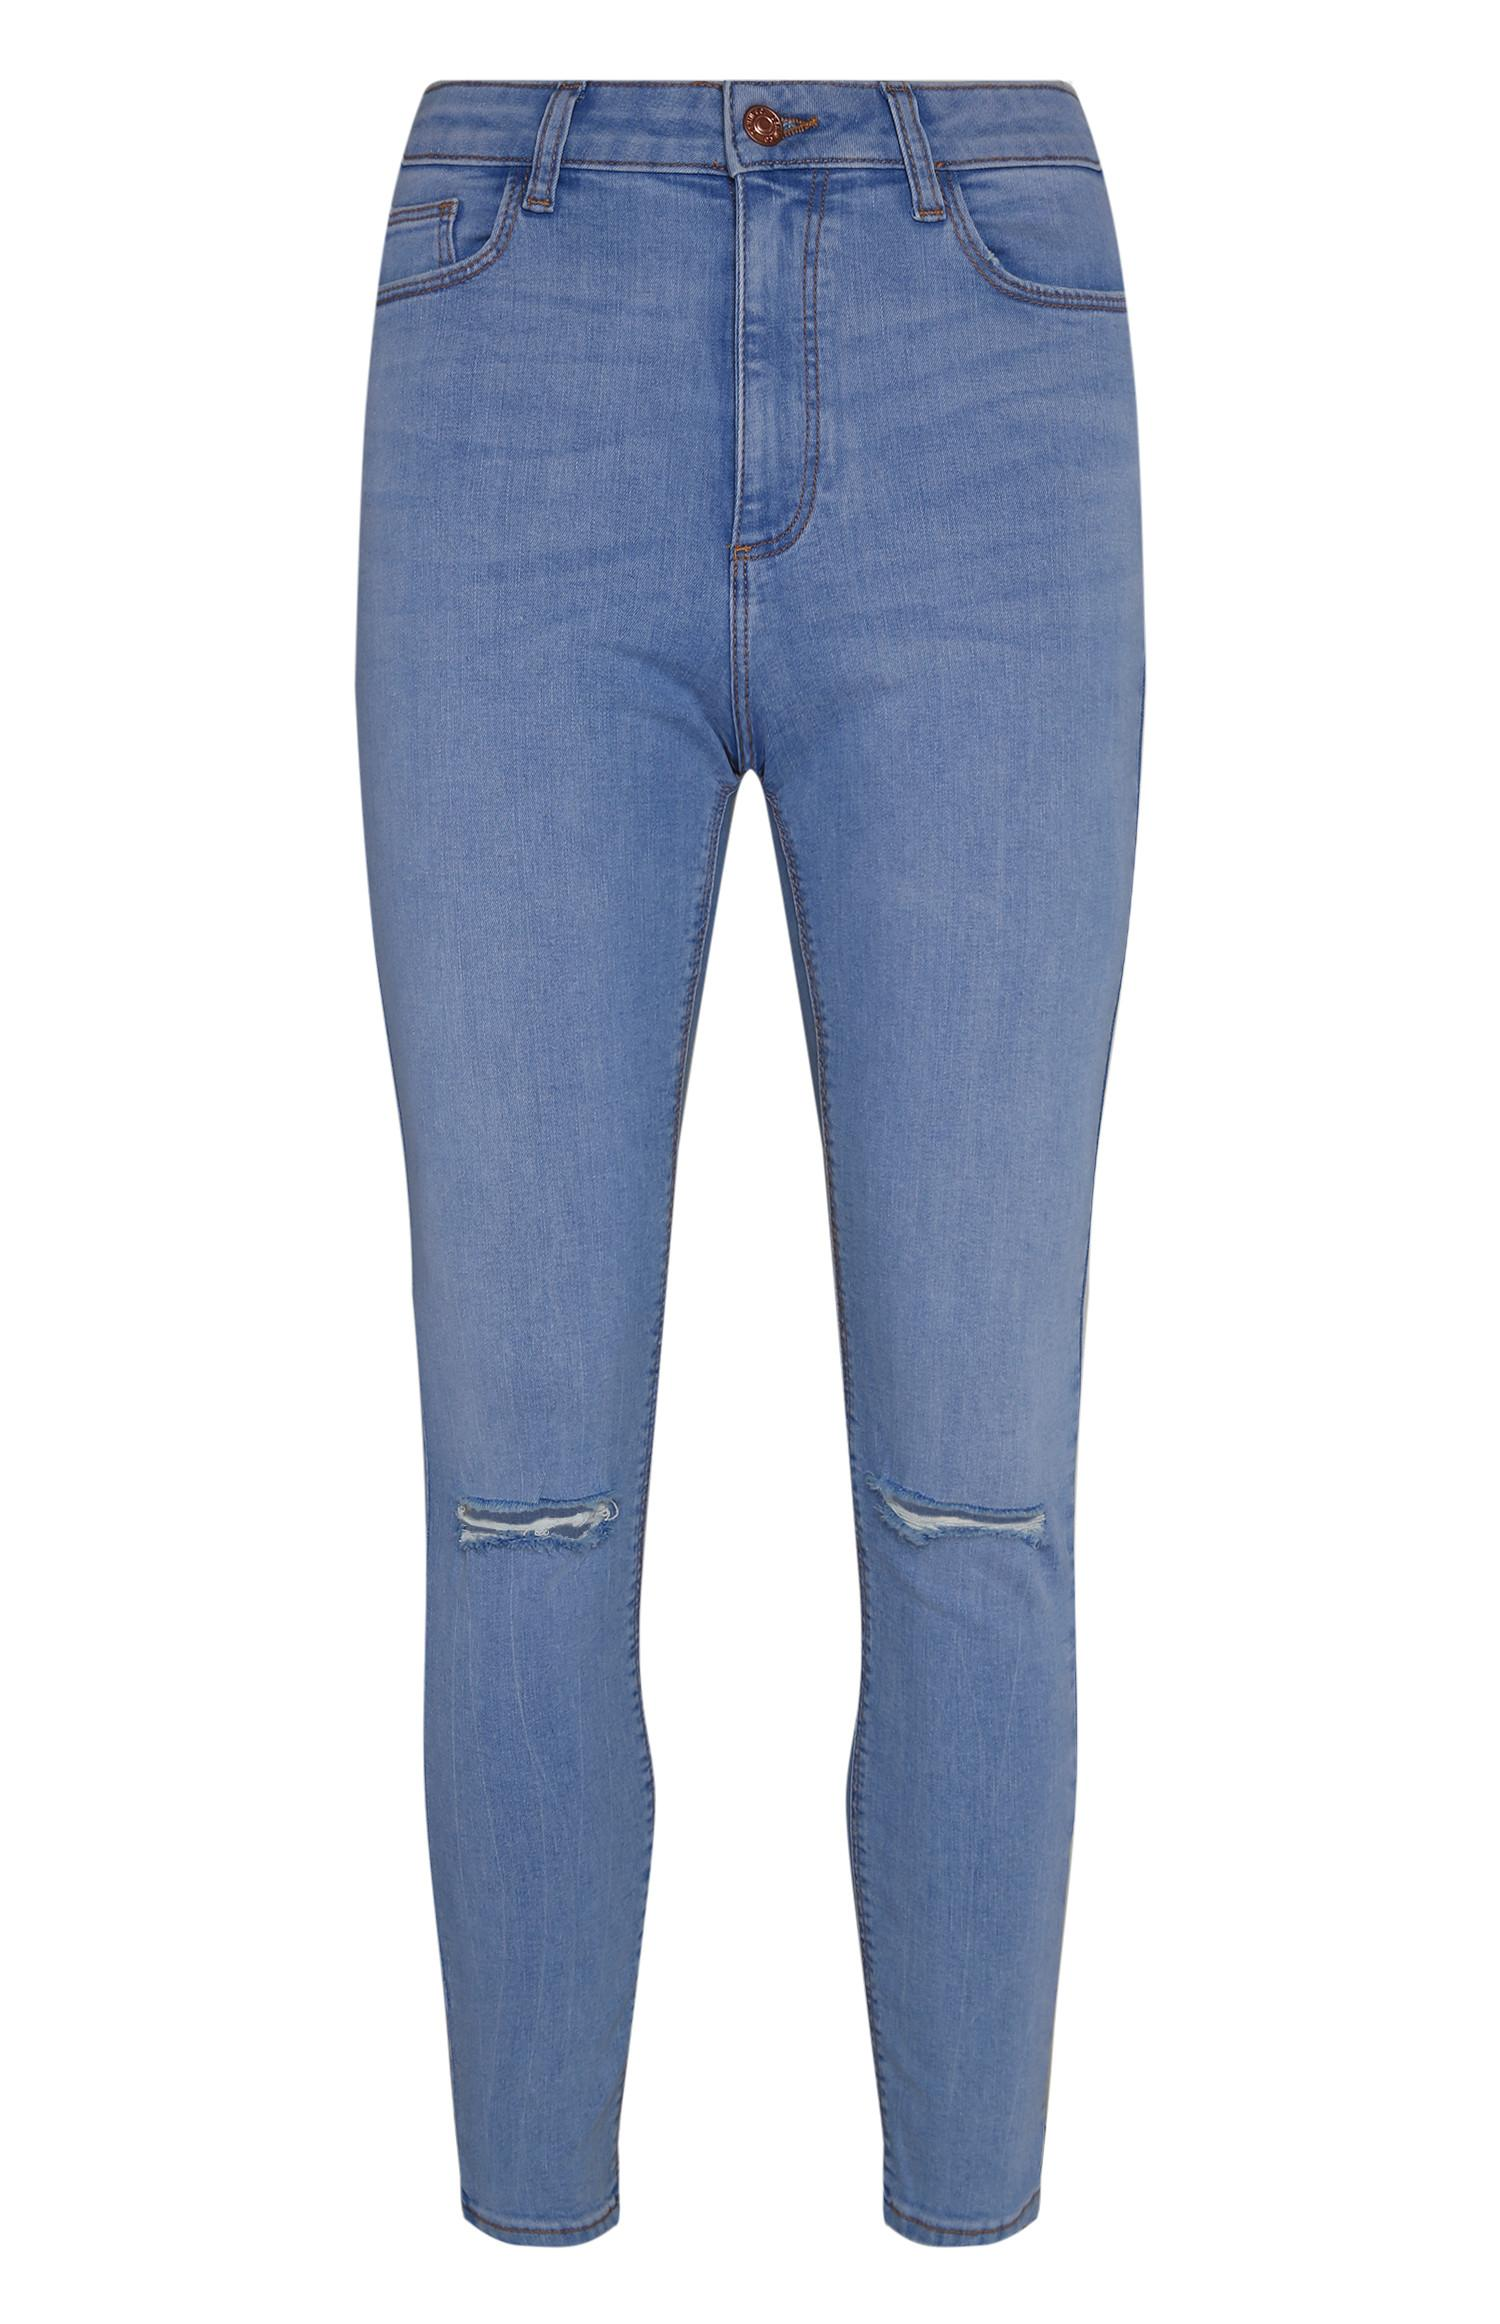 Bright Blue Skinny Jean